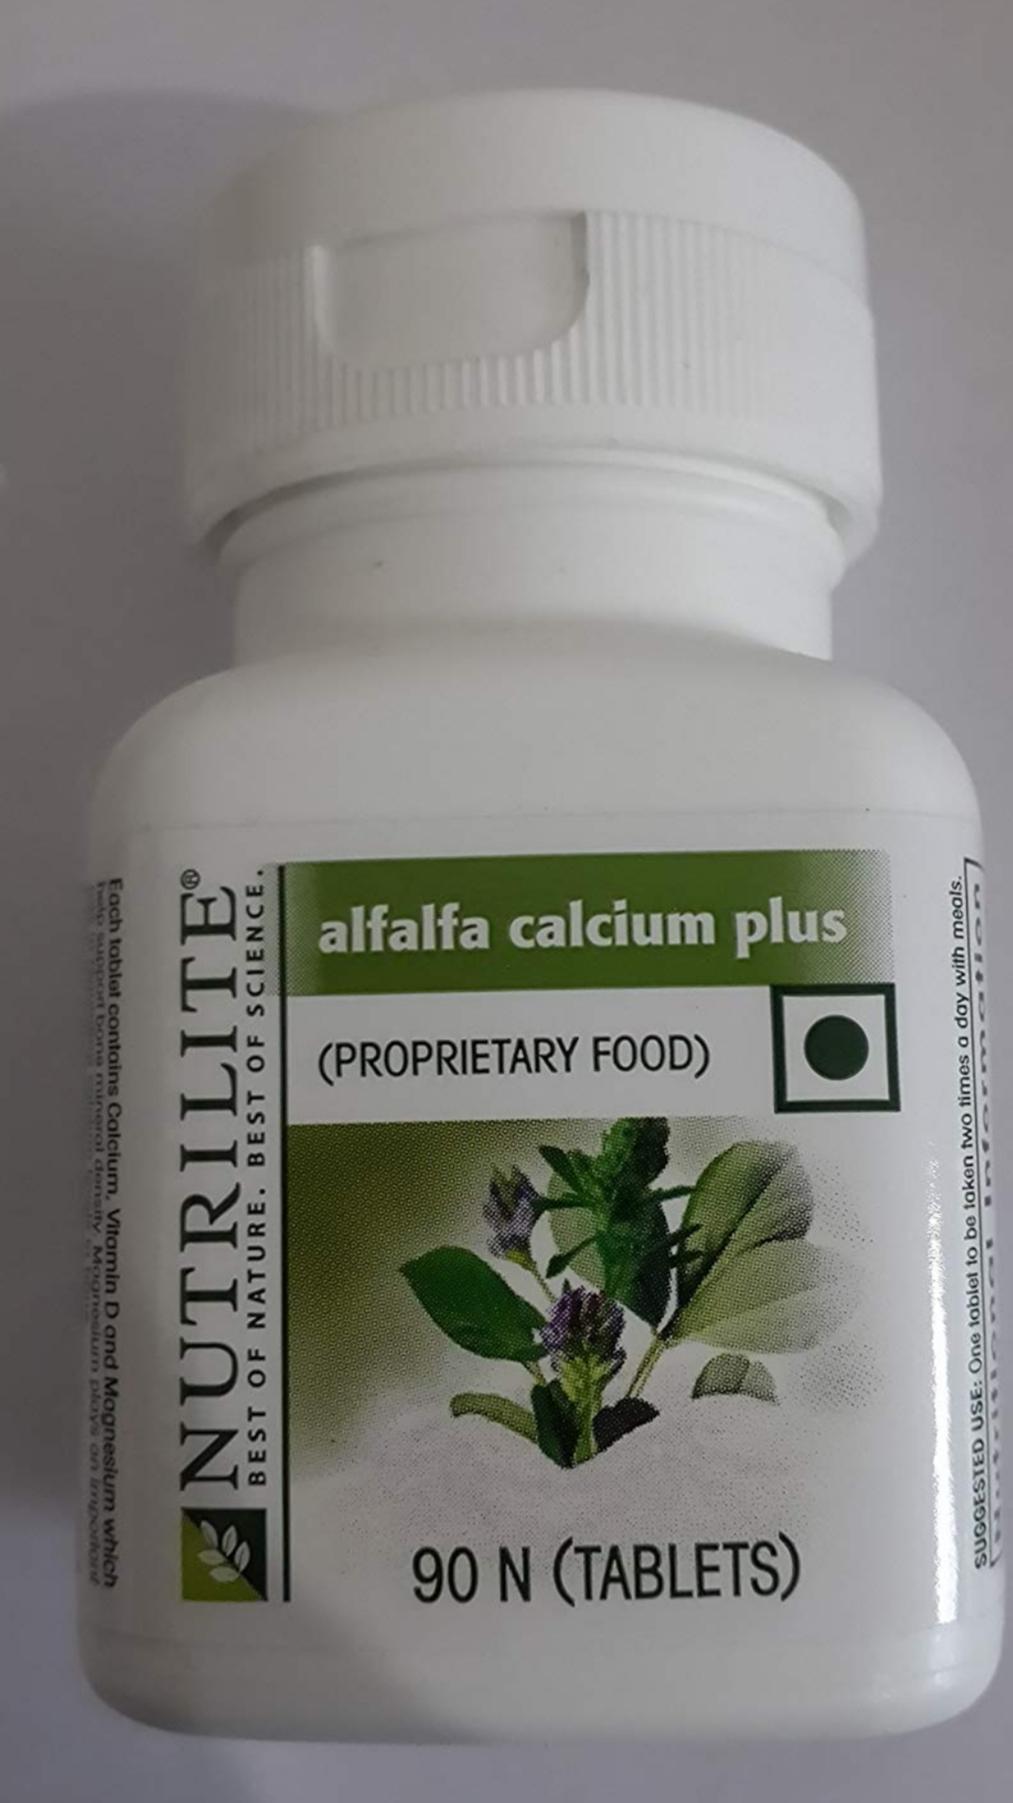 Amway Nutrilite Alfalfa Calcium Plus 90 N Tablets-Amway alfalfa calcium tablets-By simranwalia29